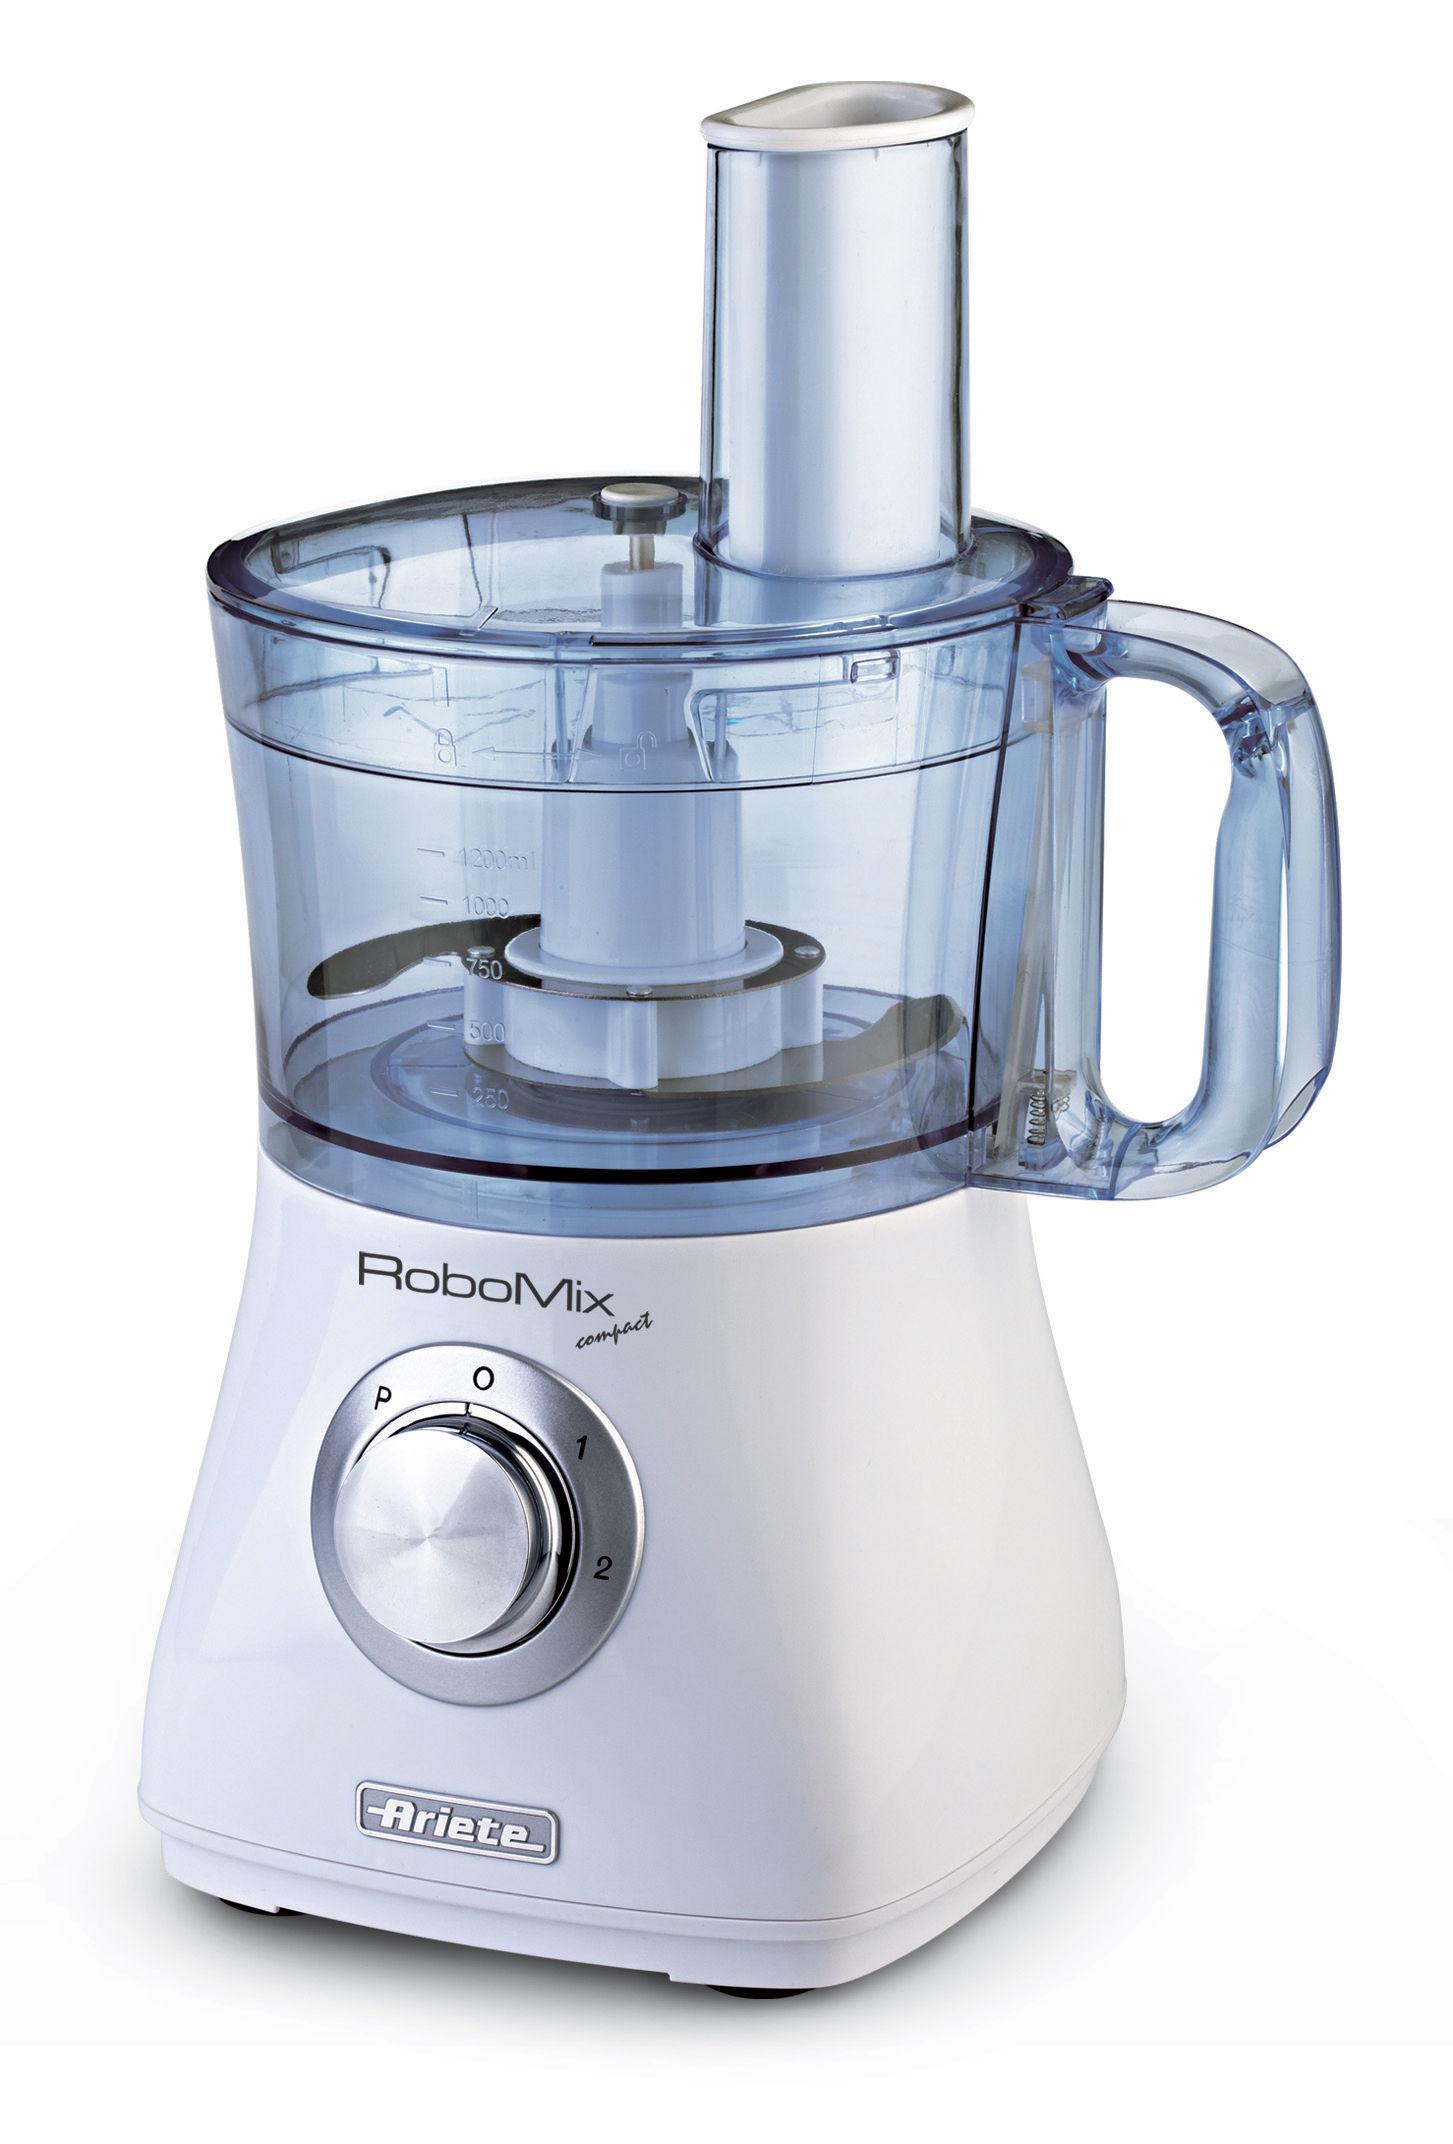 confronto robot da cucina - 28 images - best confronto robot da ...